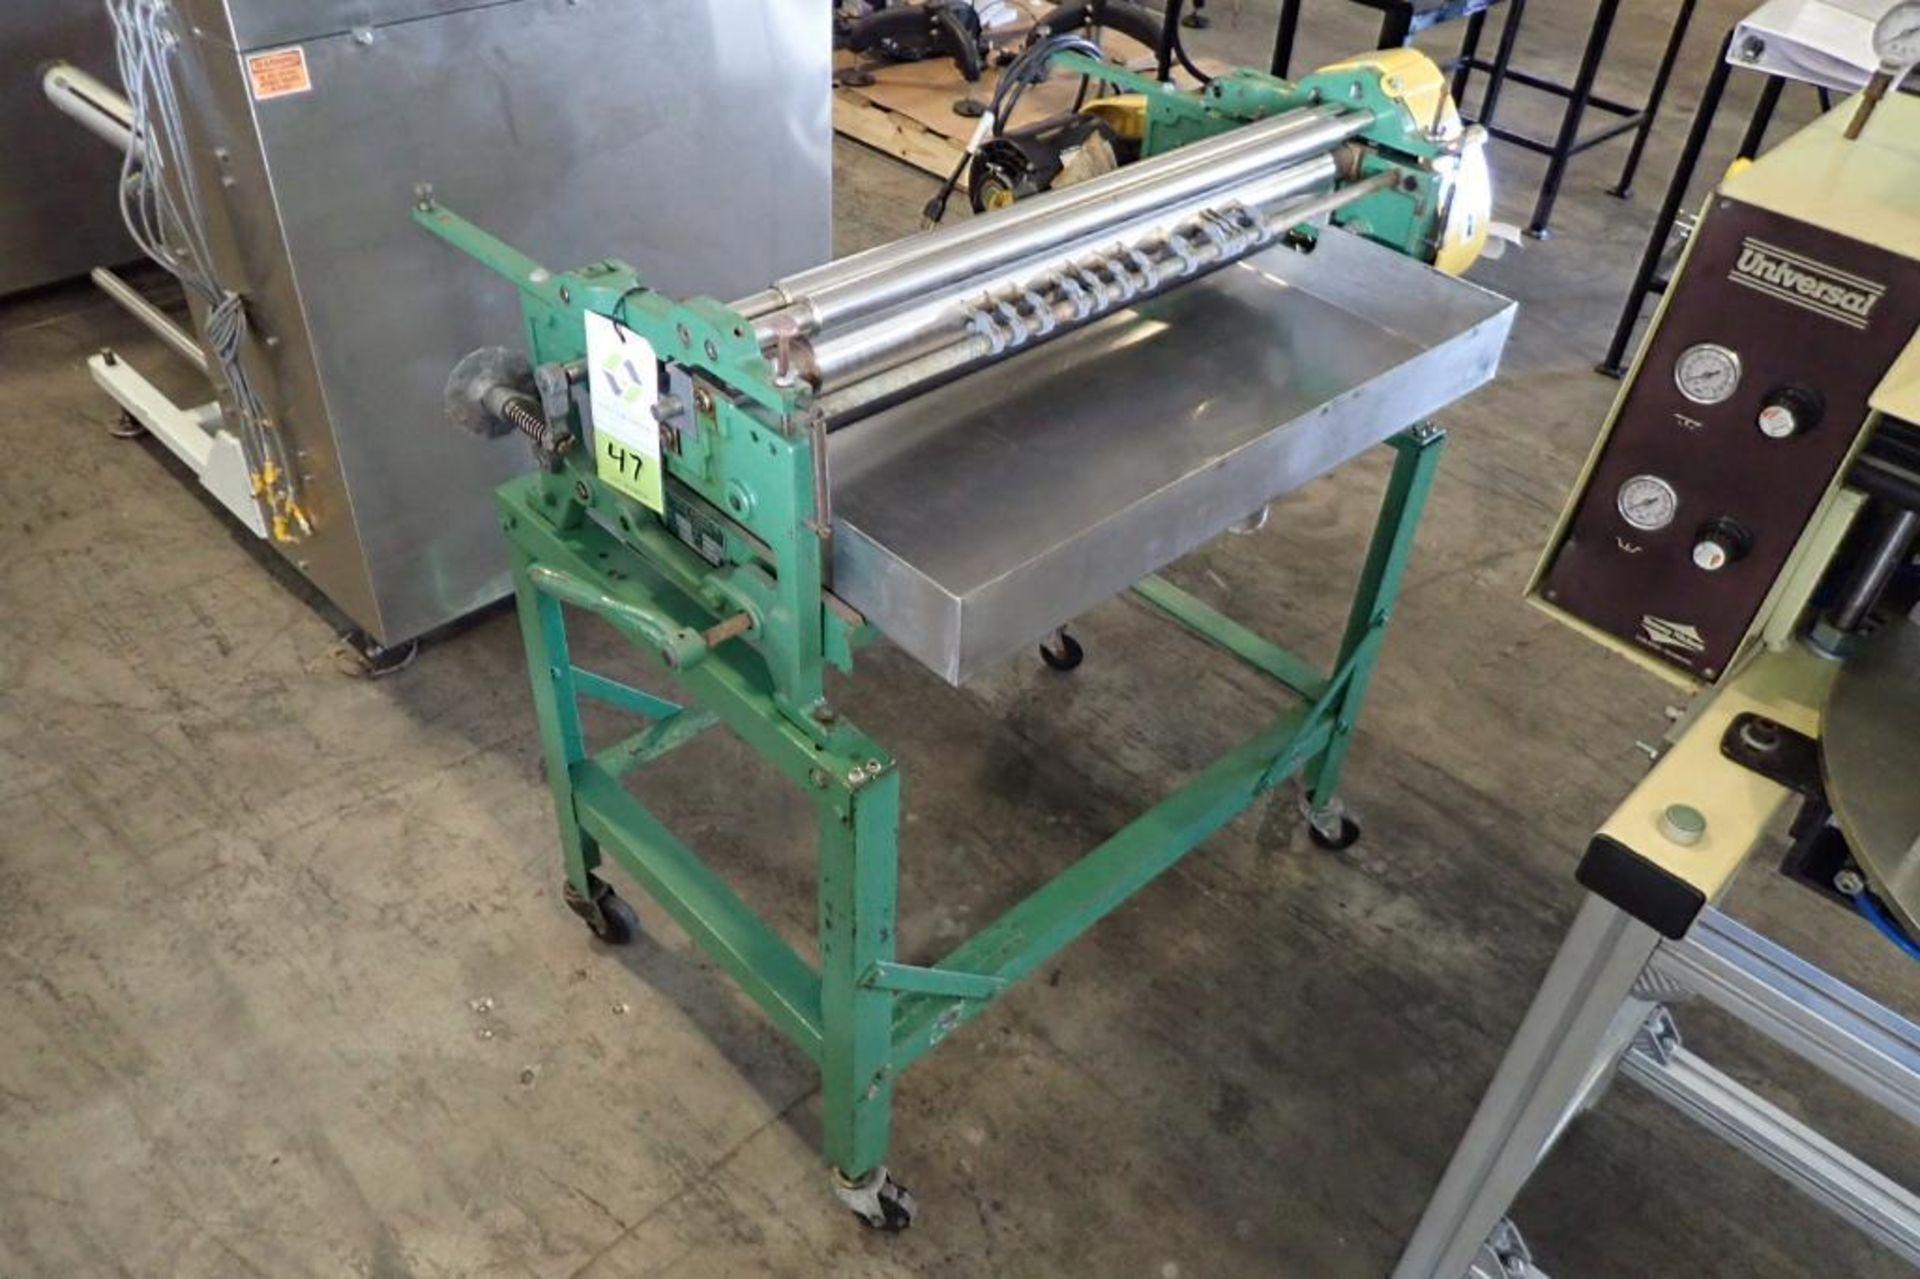 Lot 47 - Potdevin film roll feeder/stiller, Model NTZ27-86, SN 2-106, 27 in. wide, 115 volt, mild steel